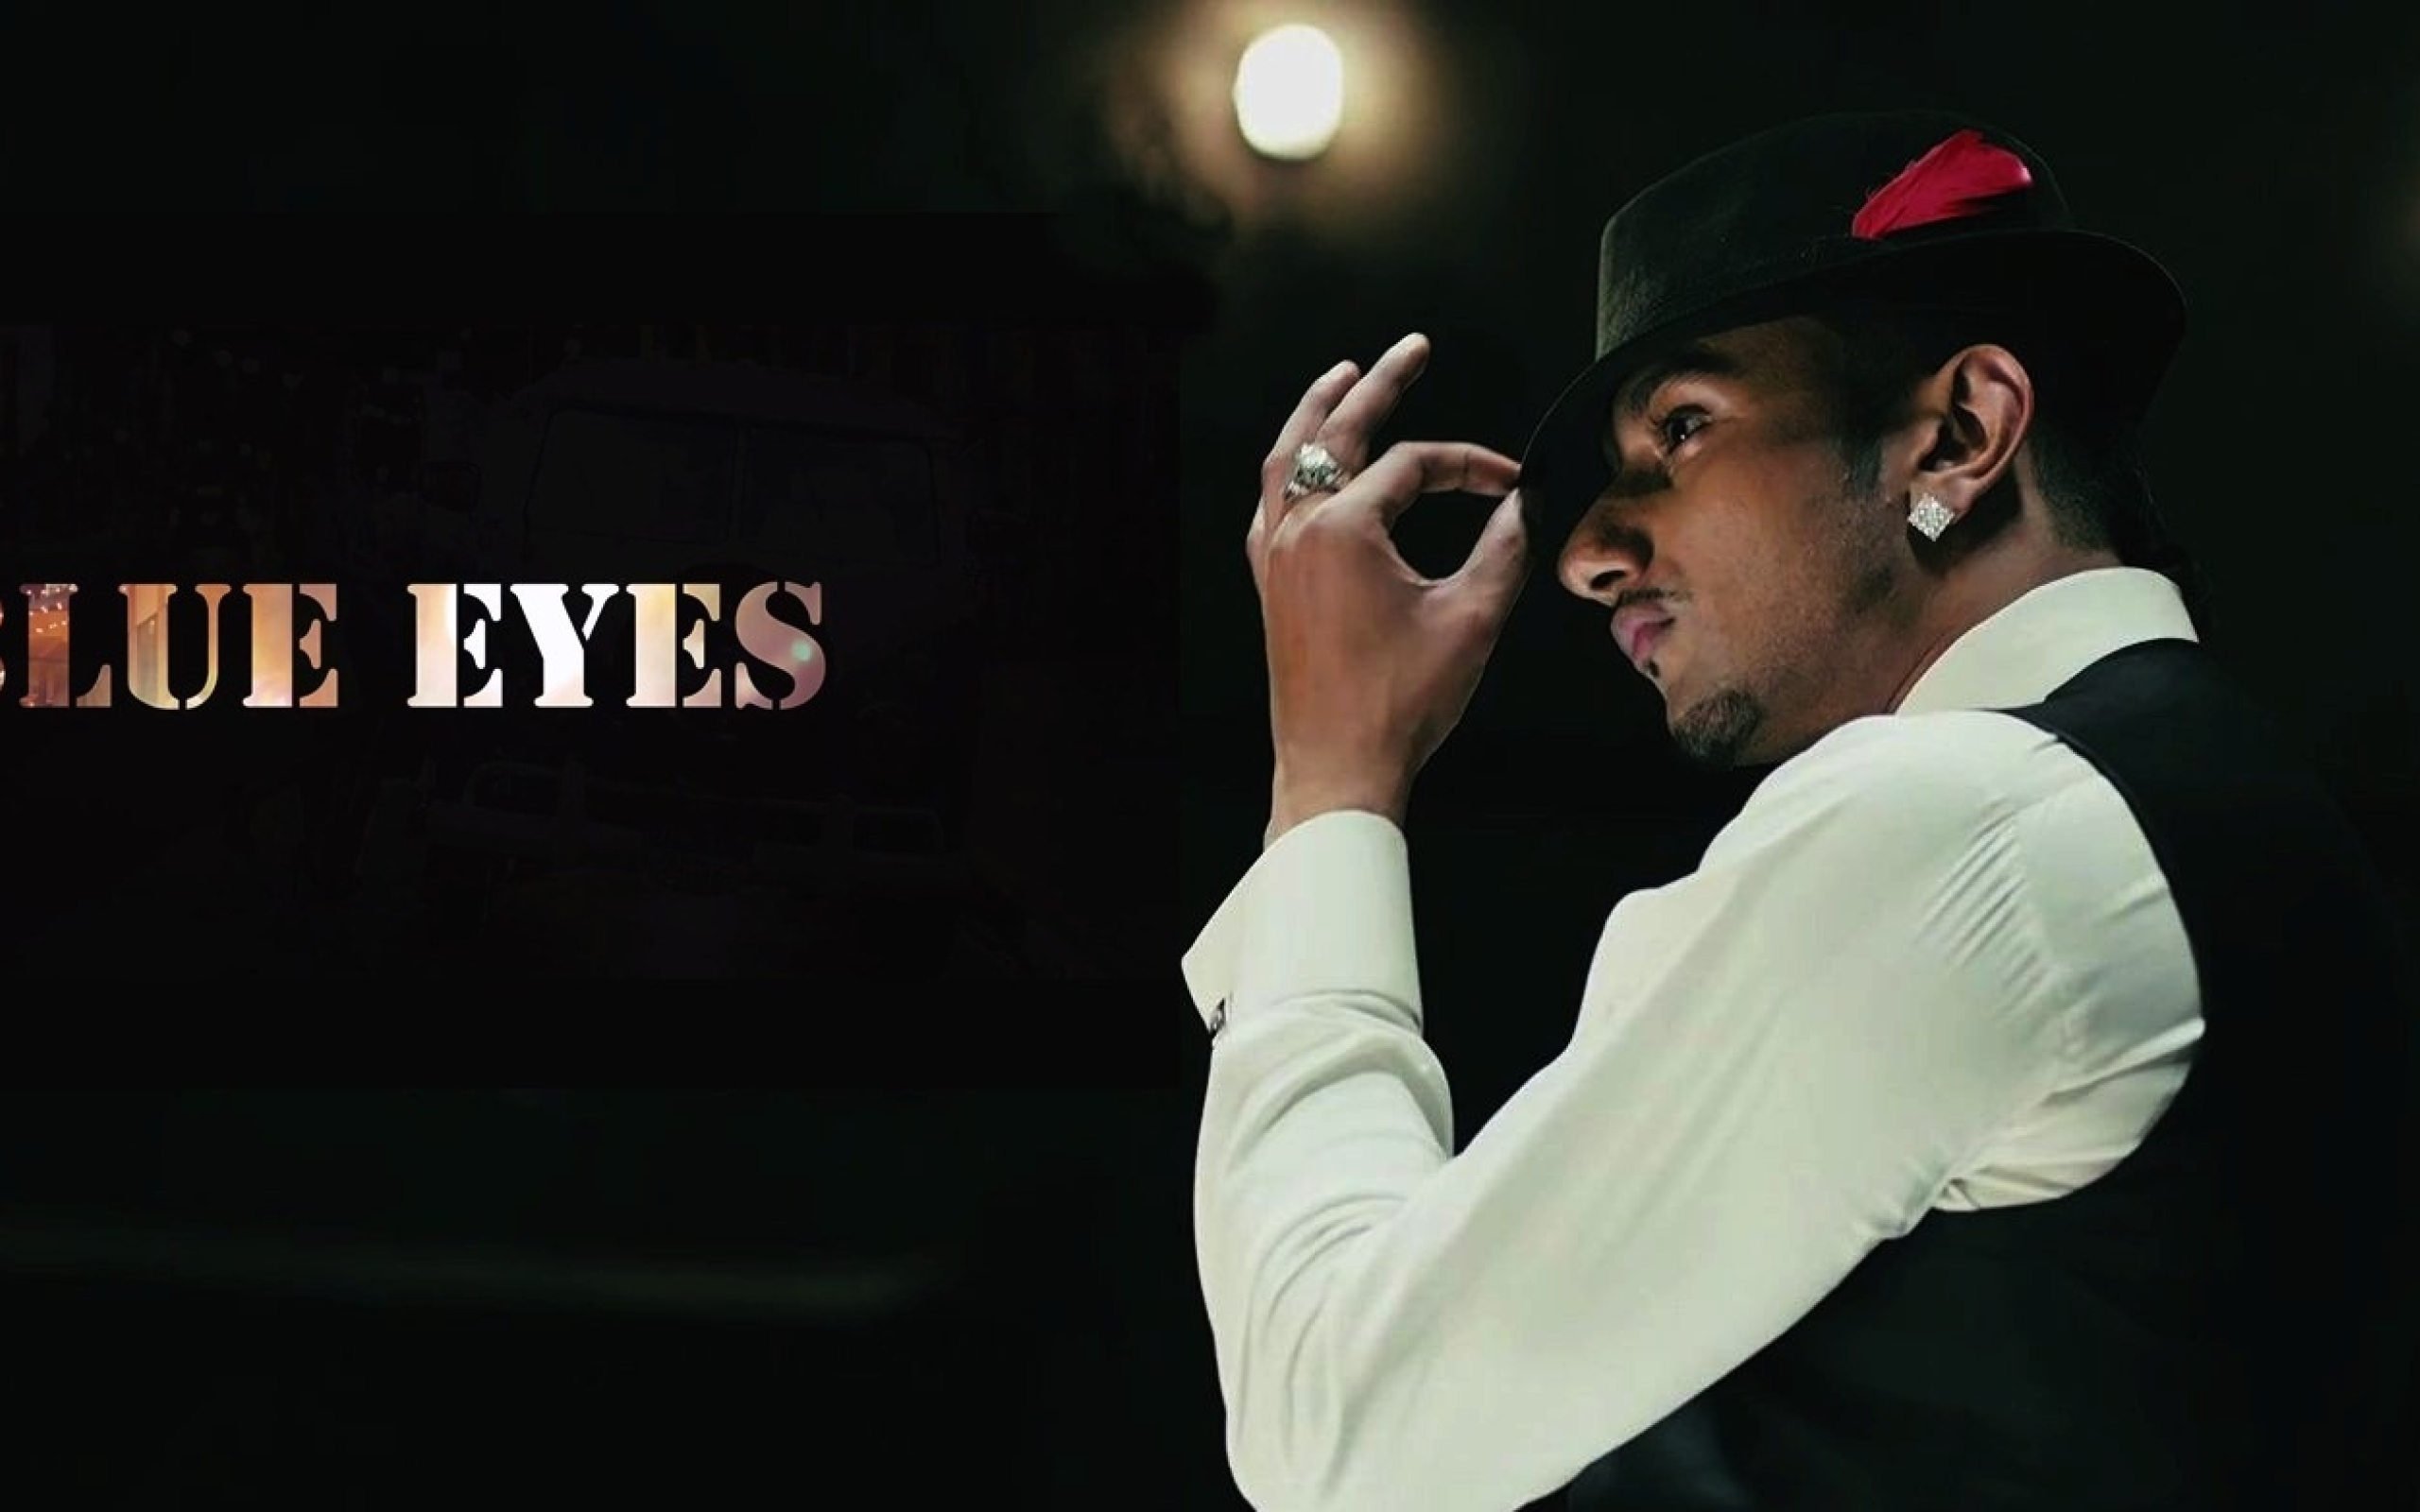 Honey Singh Wallpaper Hd Blue Eyes